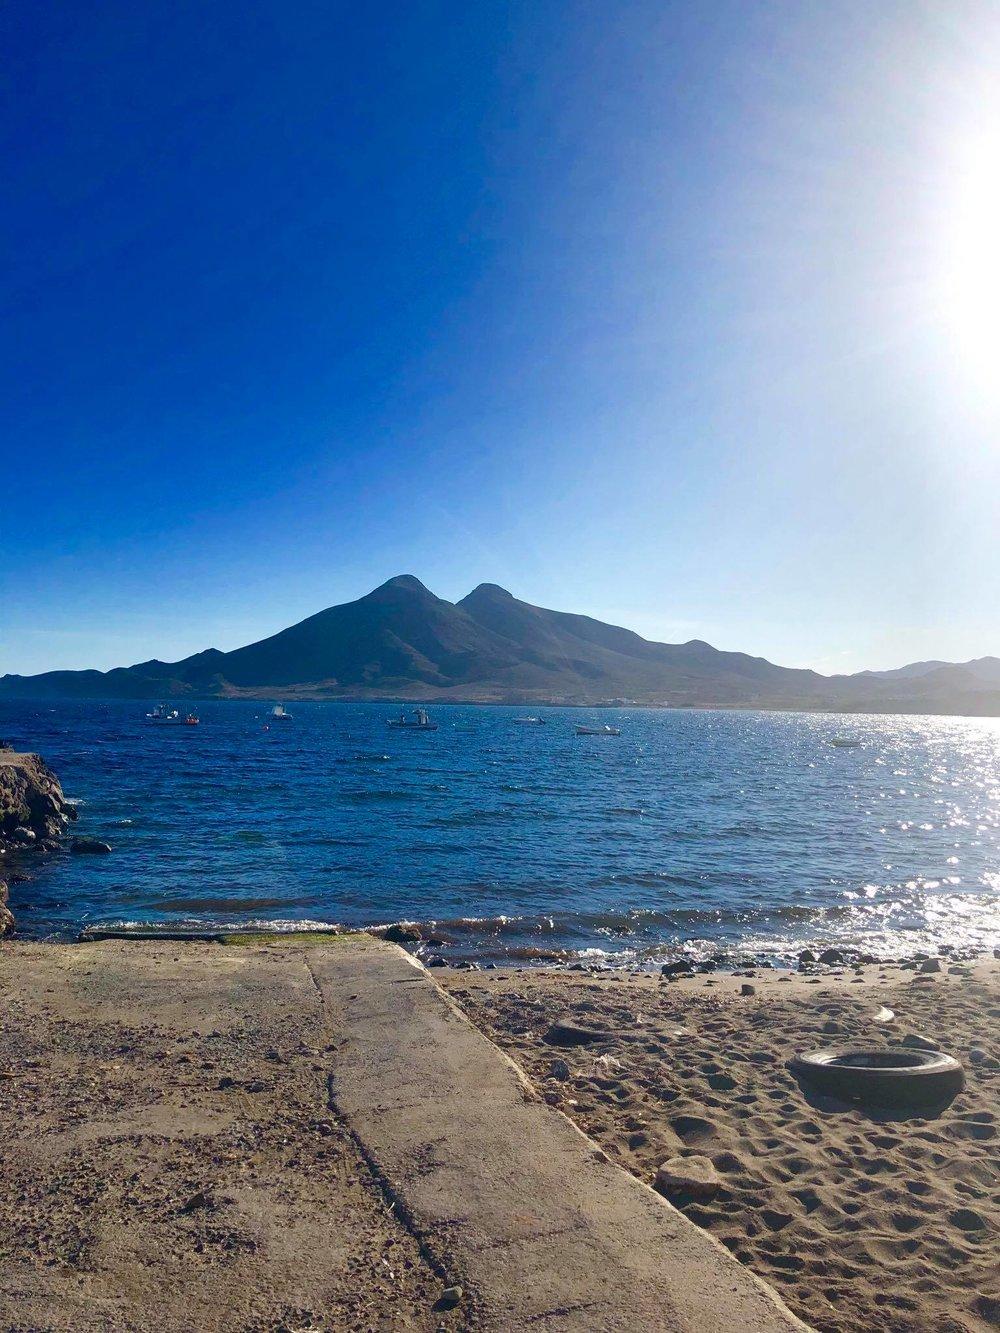 Kach Solo Travels in 2019 Spain you're so beautiful5.jpg